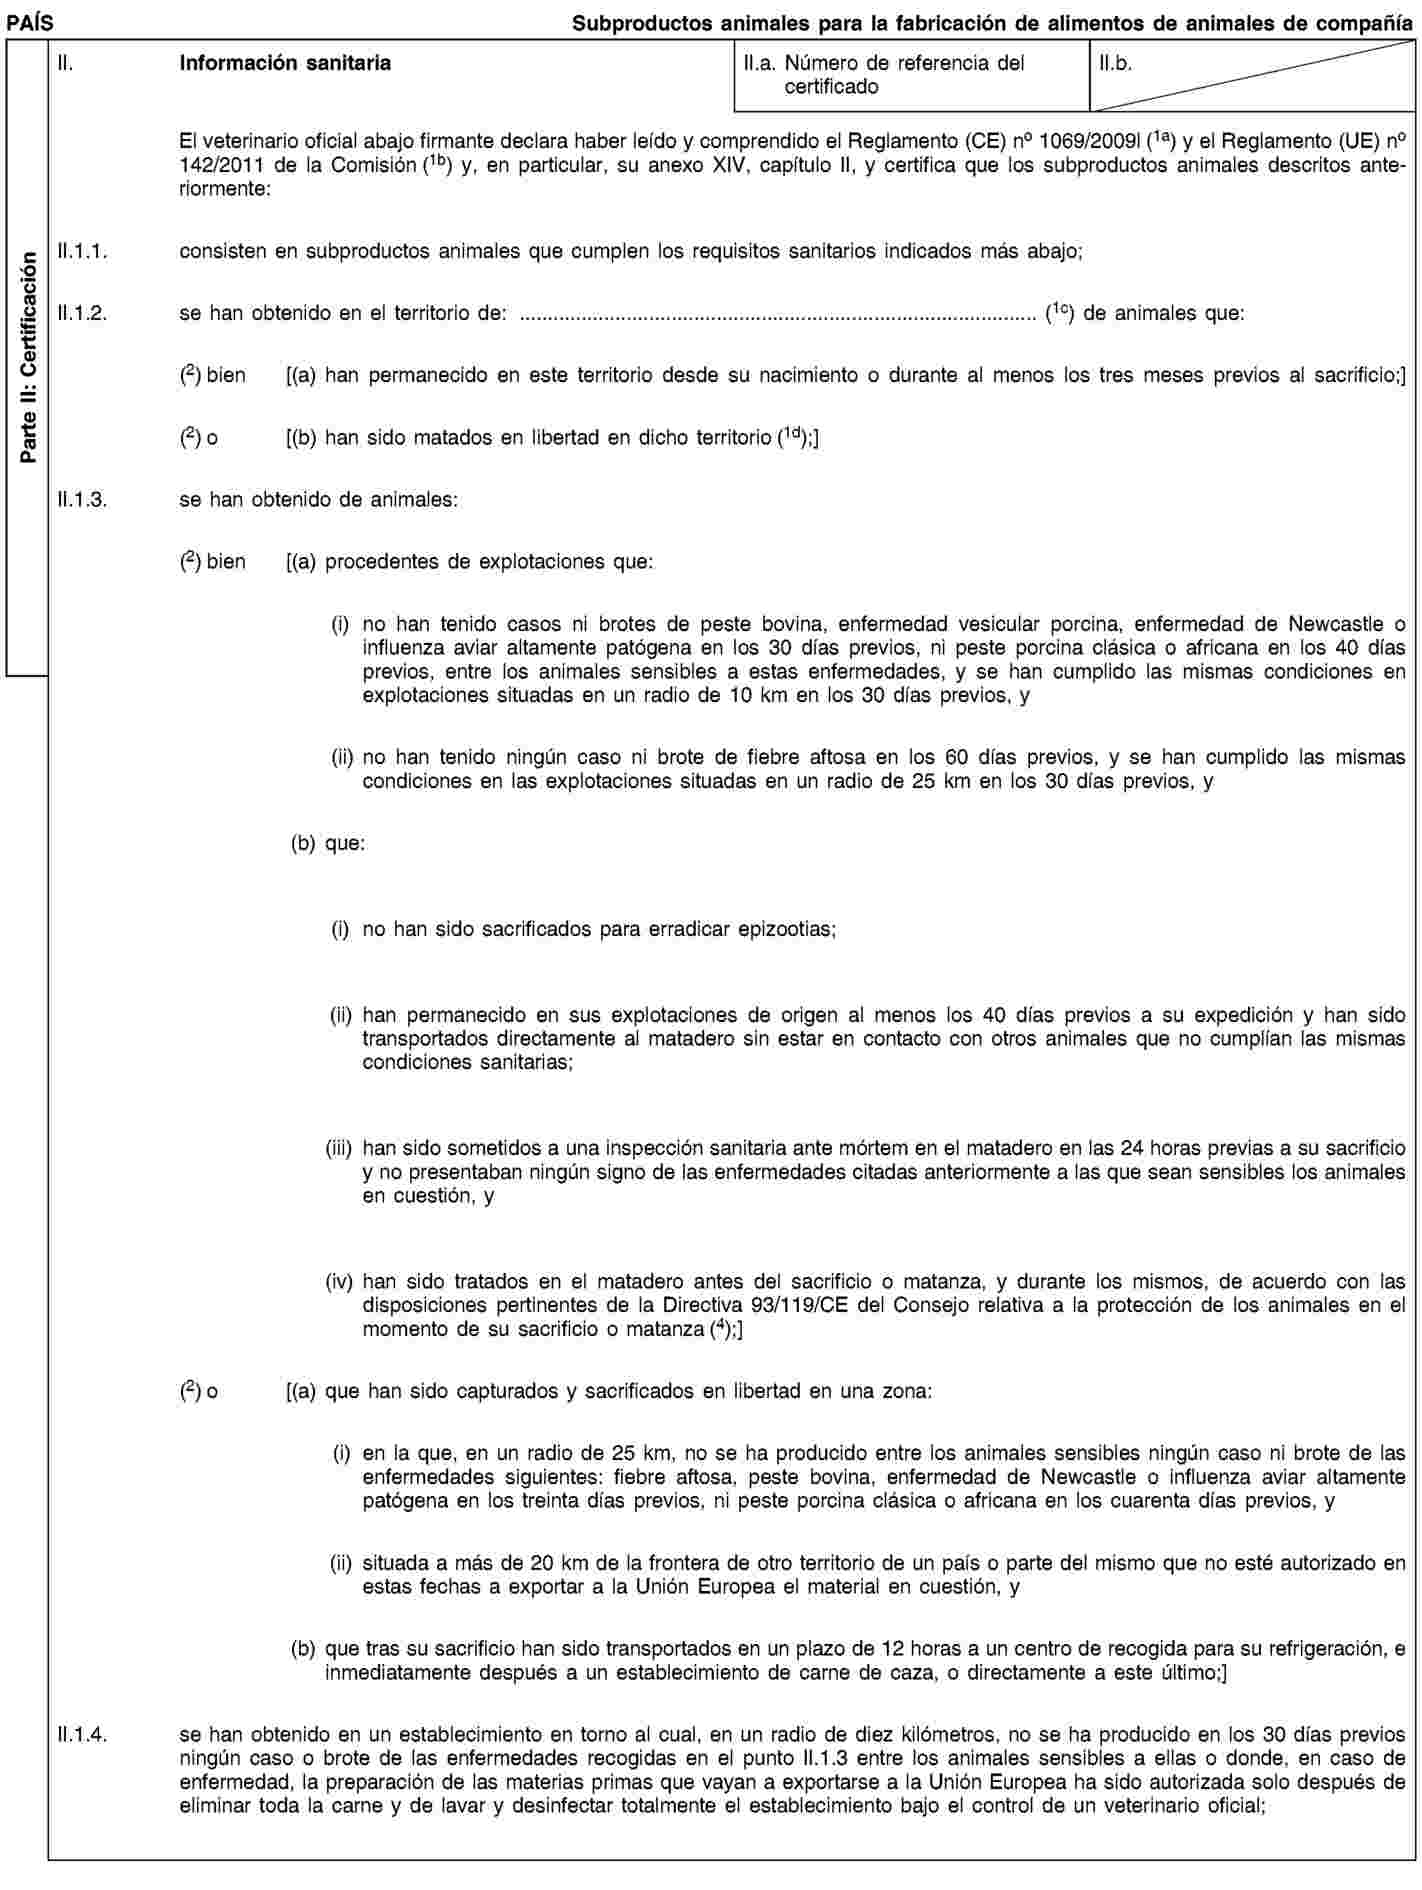 Imagen: https://eur-lex.europa.eu/resource.html?uri=uriserv:OJ.L_.2011.054.01.0001.01.SPA.xhtml.L_2011054ES.01015601.tif.jpg